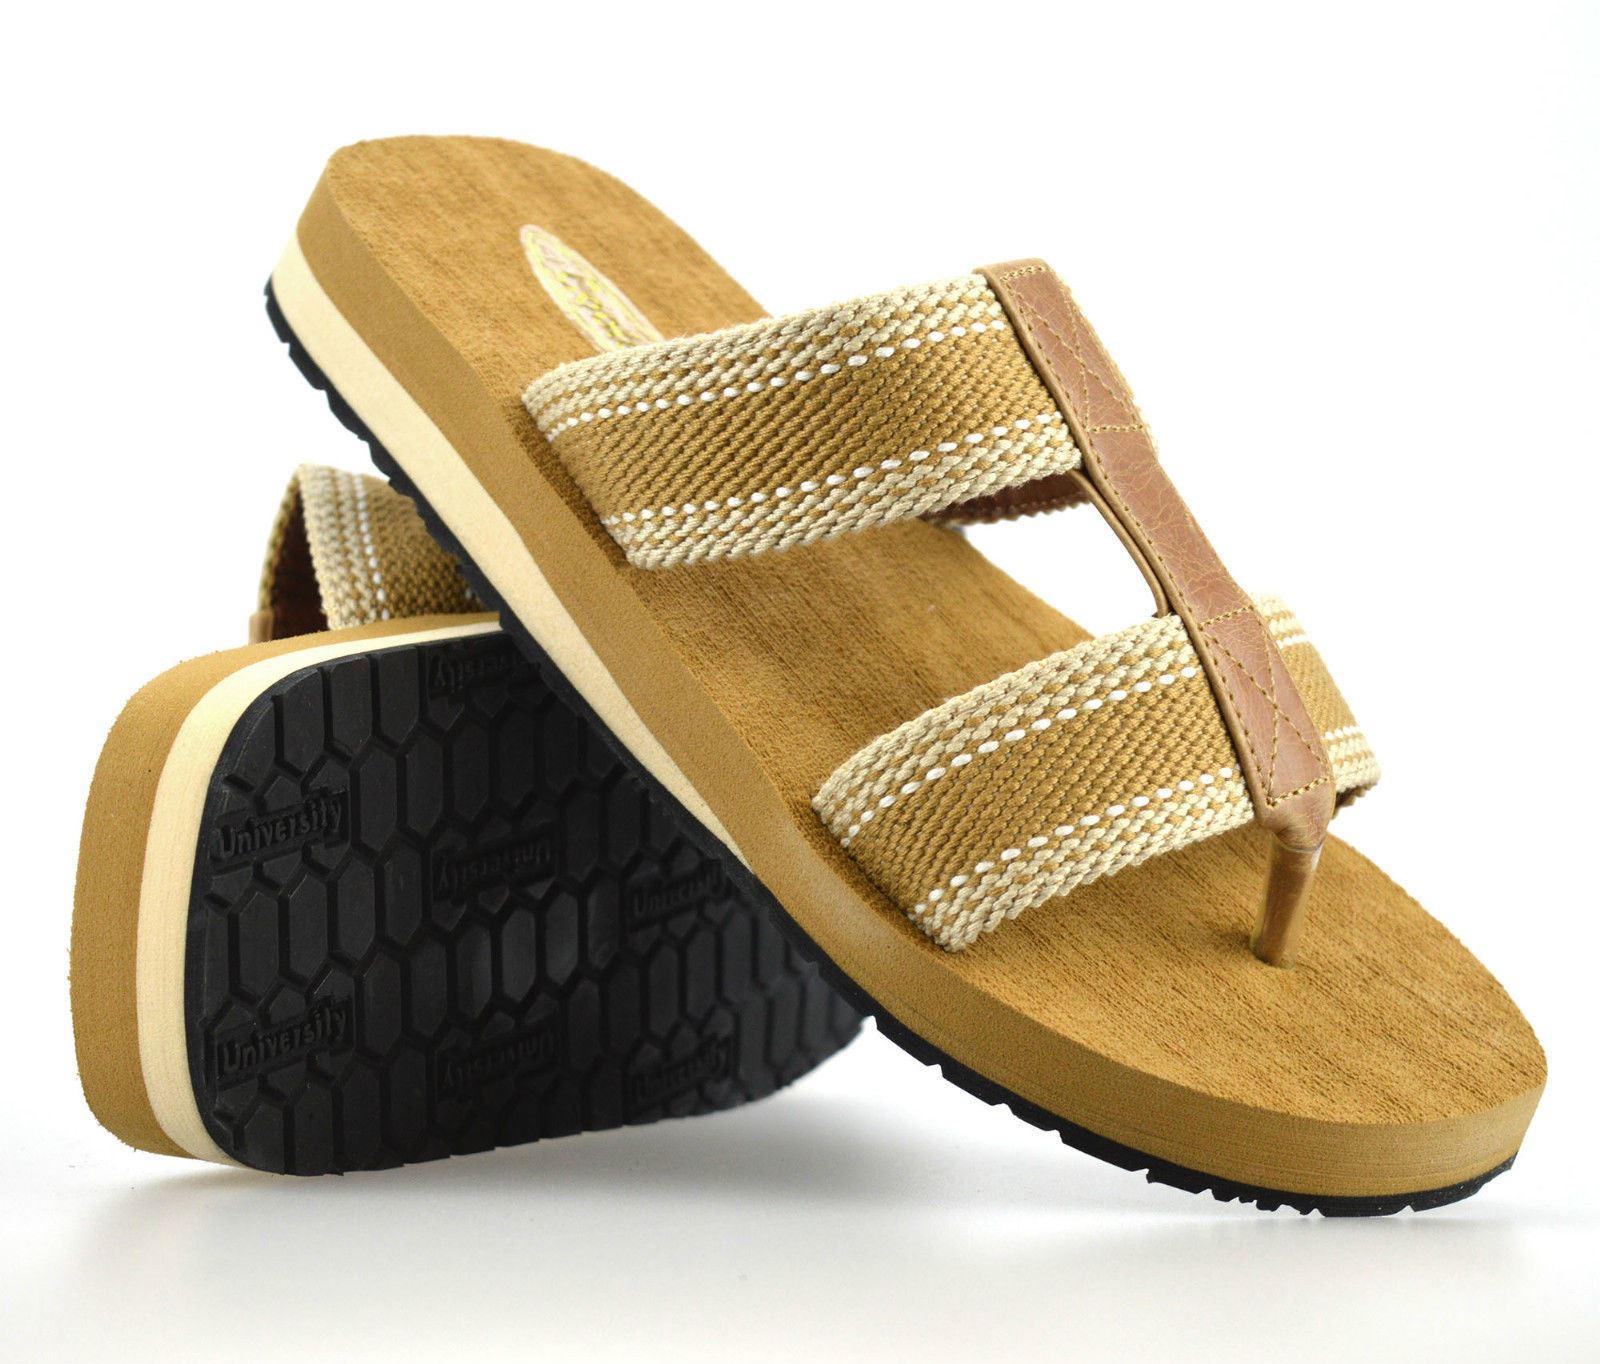 fa1e11e9ece Details about Mens Gladiator Sandals Summer Beach Cushioned Walking Flip  Flop Mules Shoe Size